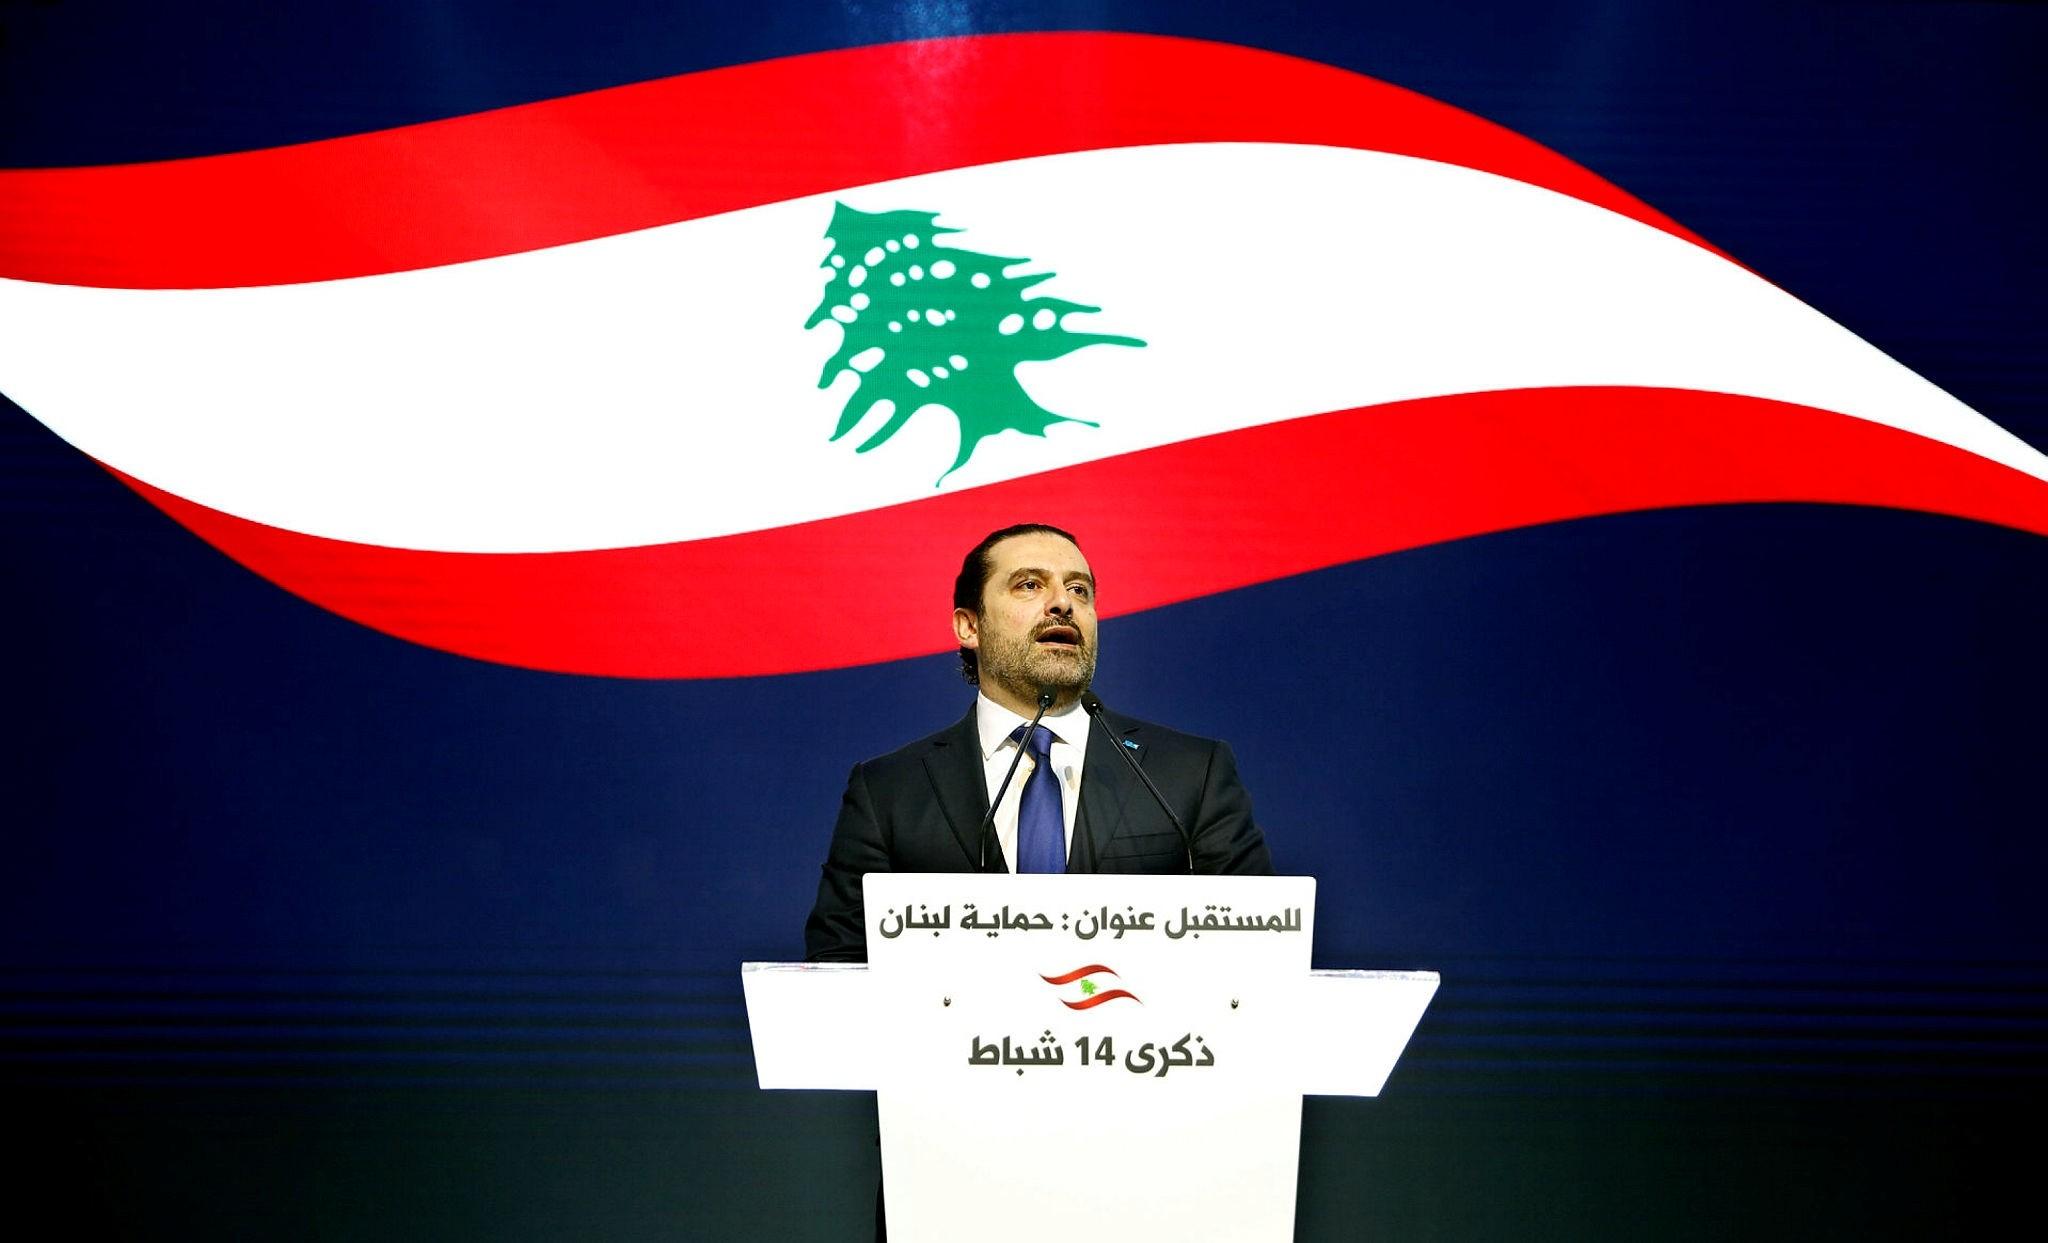 Lebanese Prime Minister Saad Hariri speaks during a ceremony, Beirut, Feb. 14.